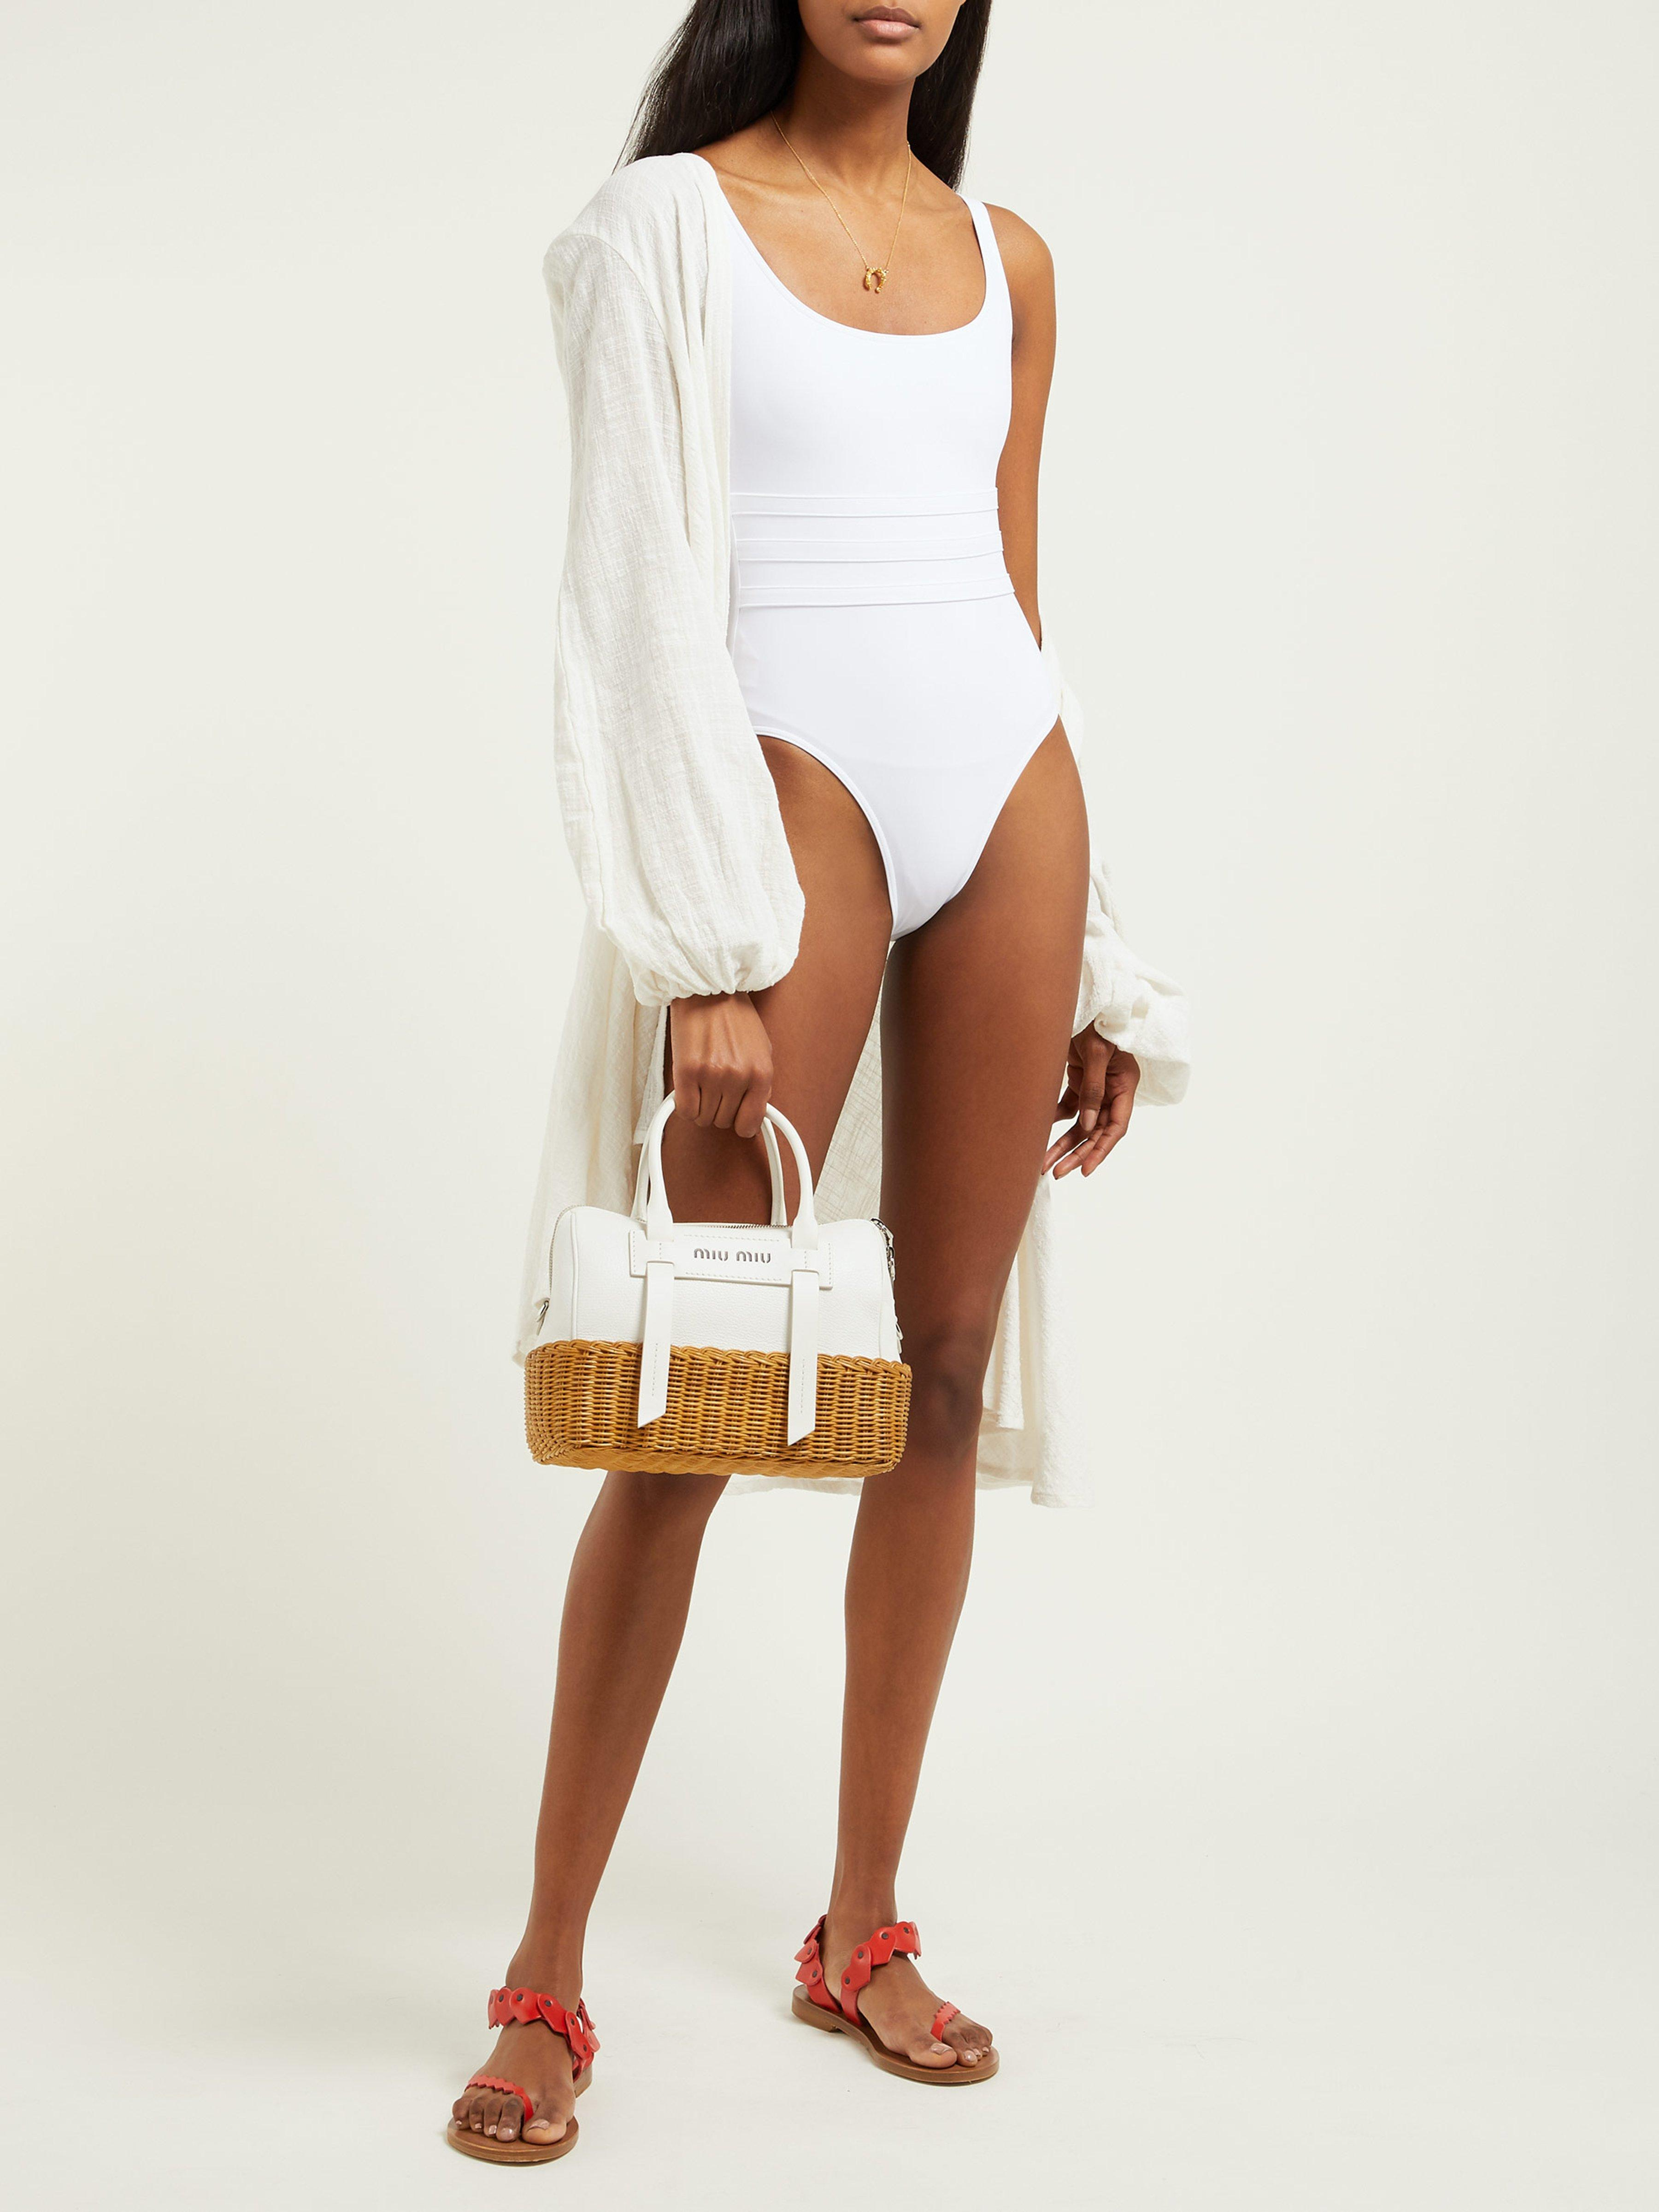 4309b0decb0 Eres Duni Asia Scoop Neck Swimsuit in White - Lyst